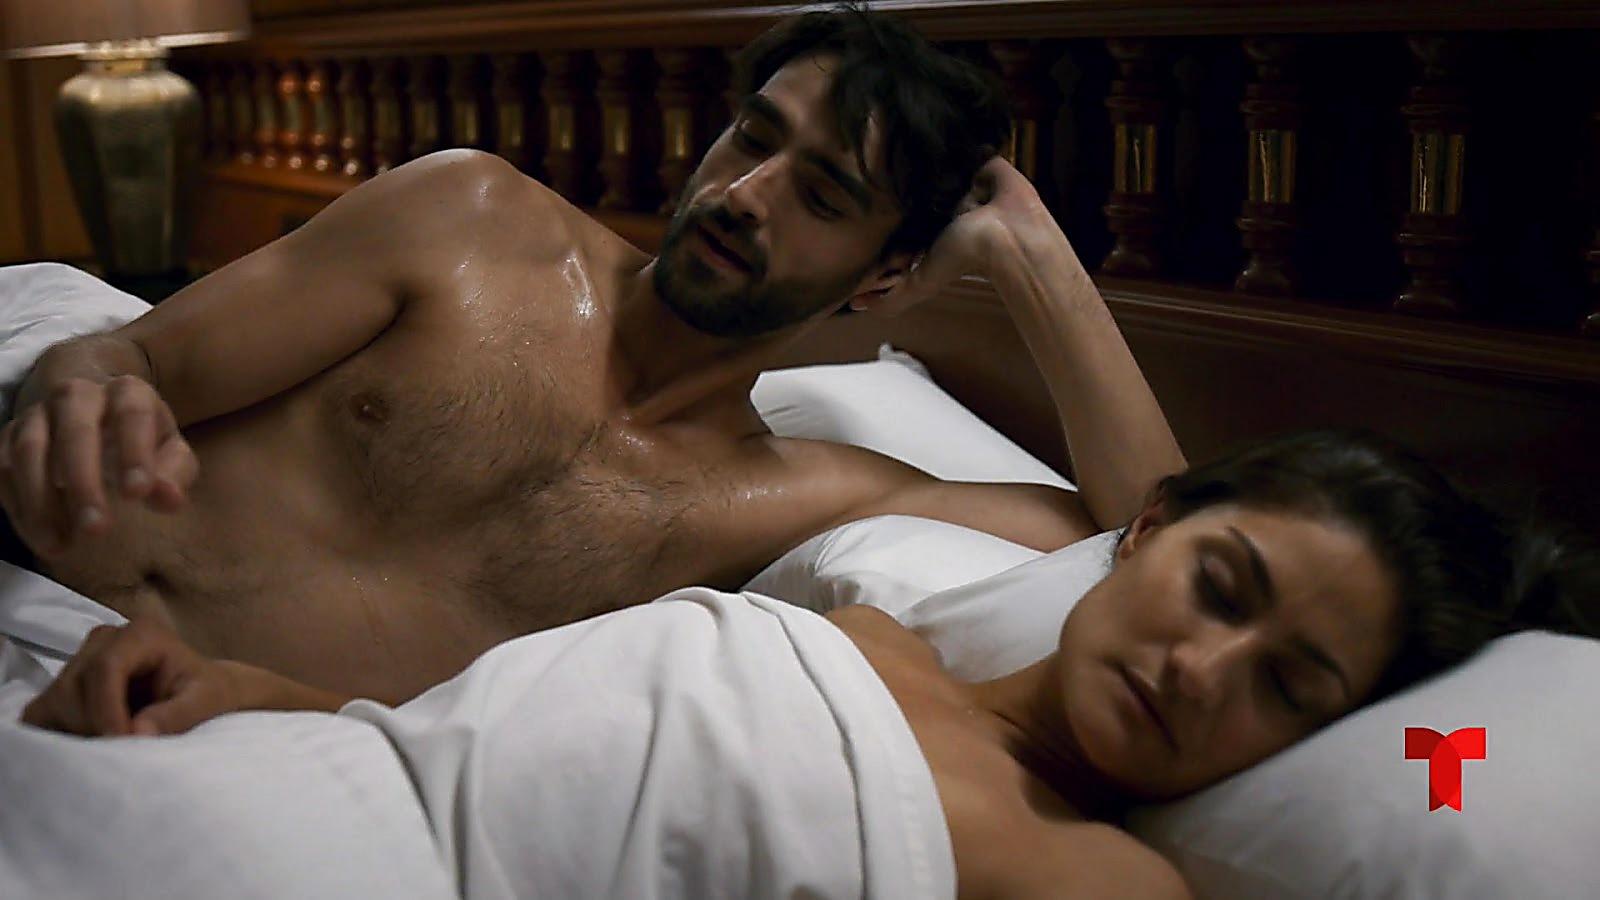 Aitor Luna sexy shirtless scene July 20, 2020, 1pm